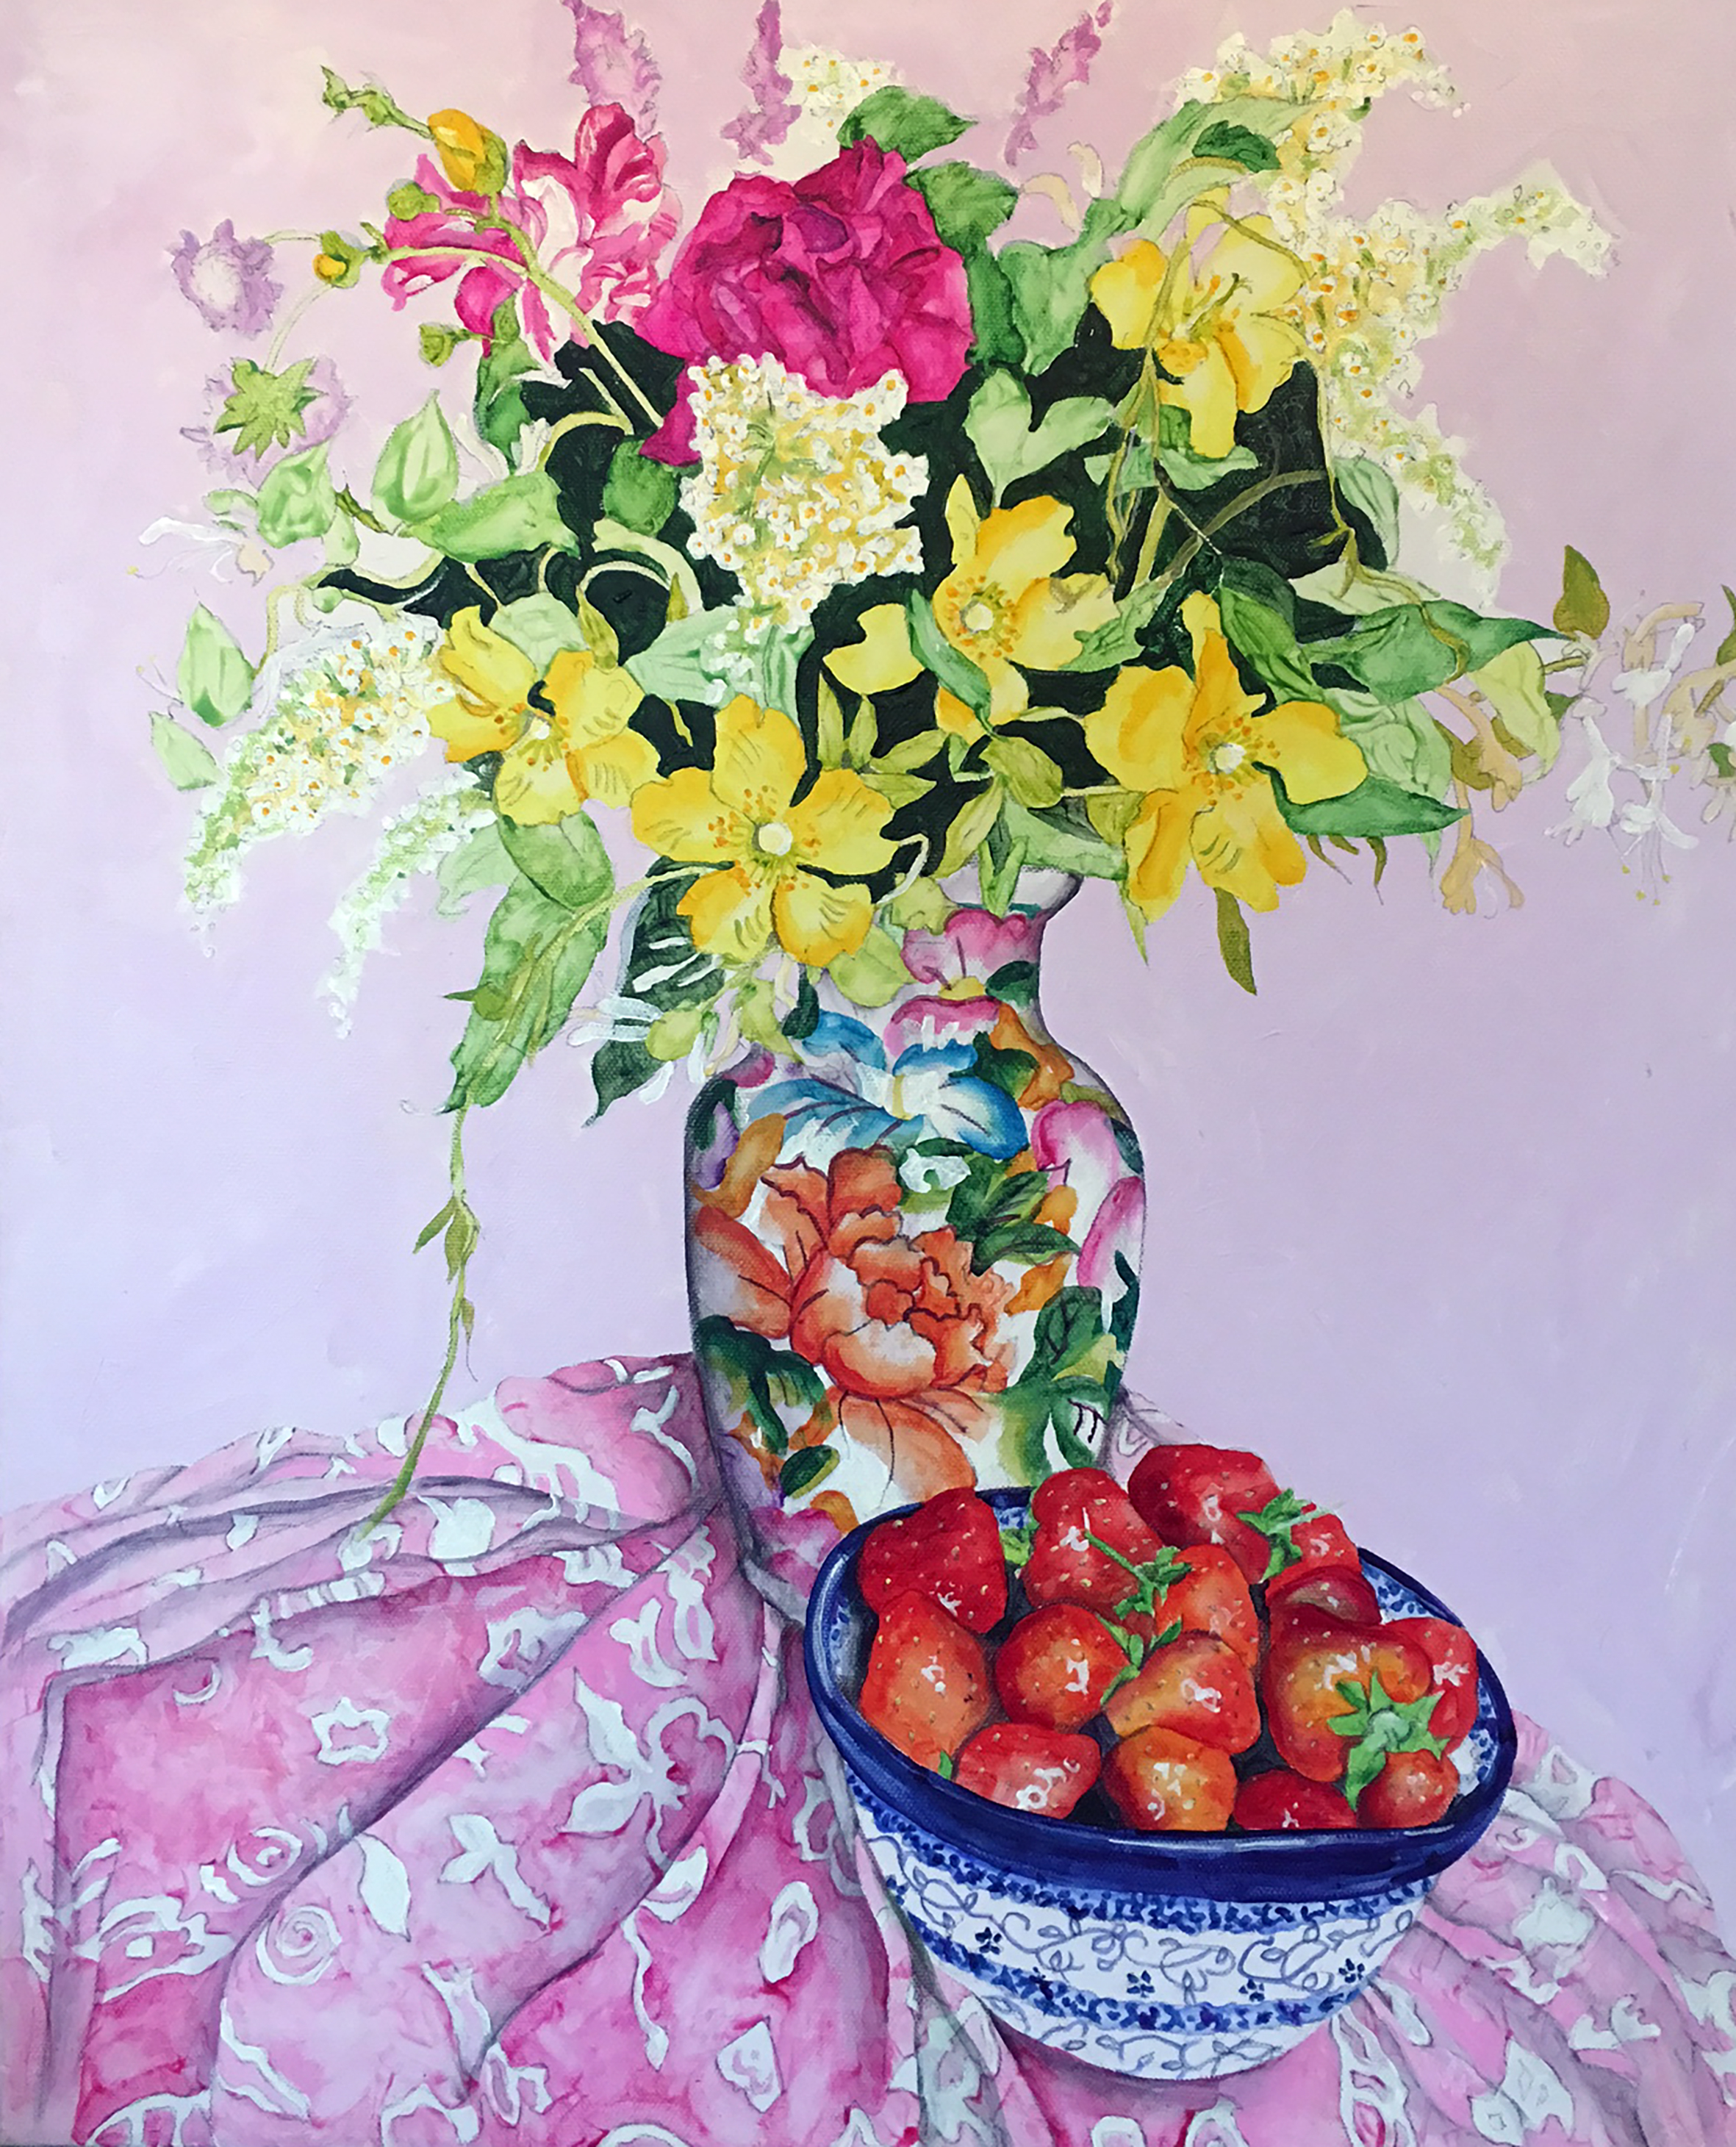 Garden Flowers & Stawberries